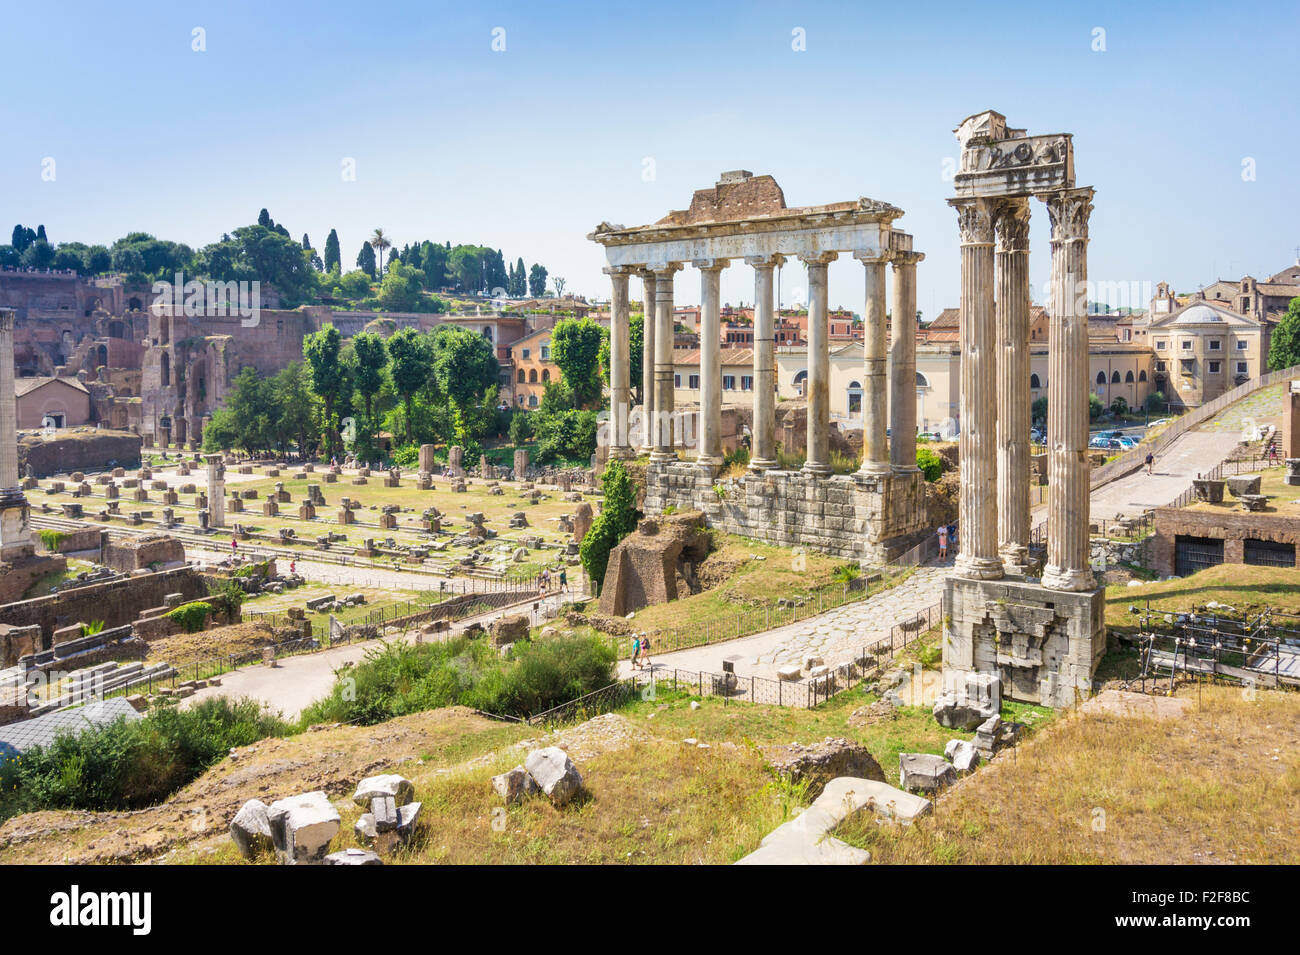 Forum Romanum Rome Roman archaeology Italy Italian Stock Photo ...